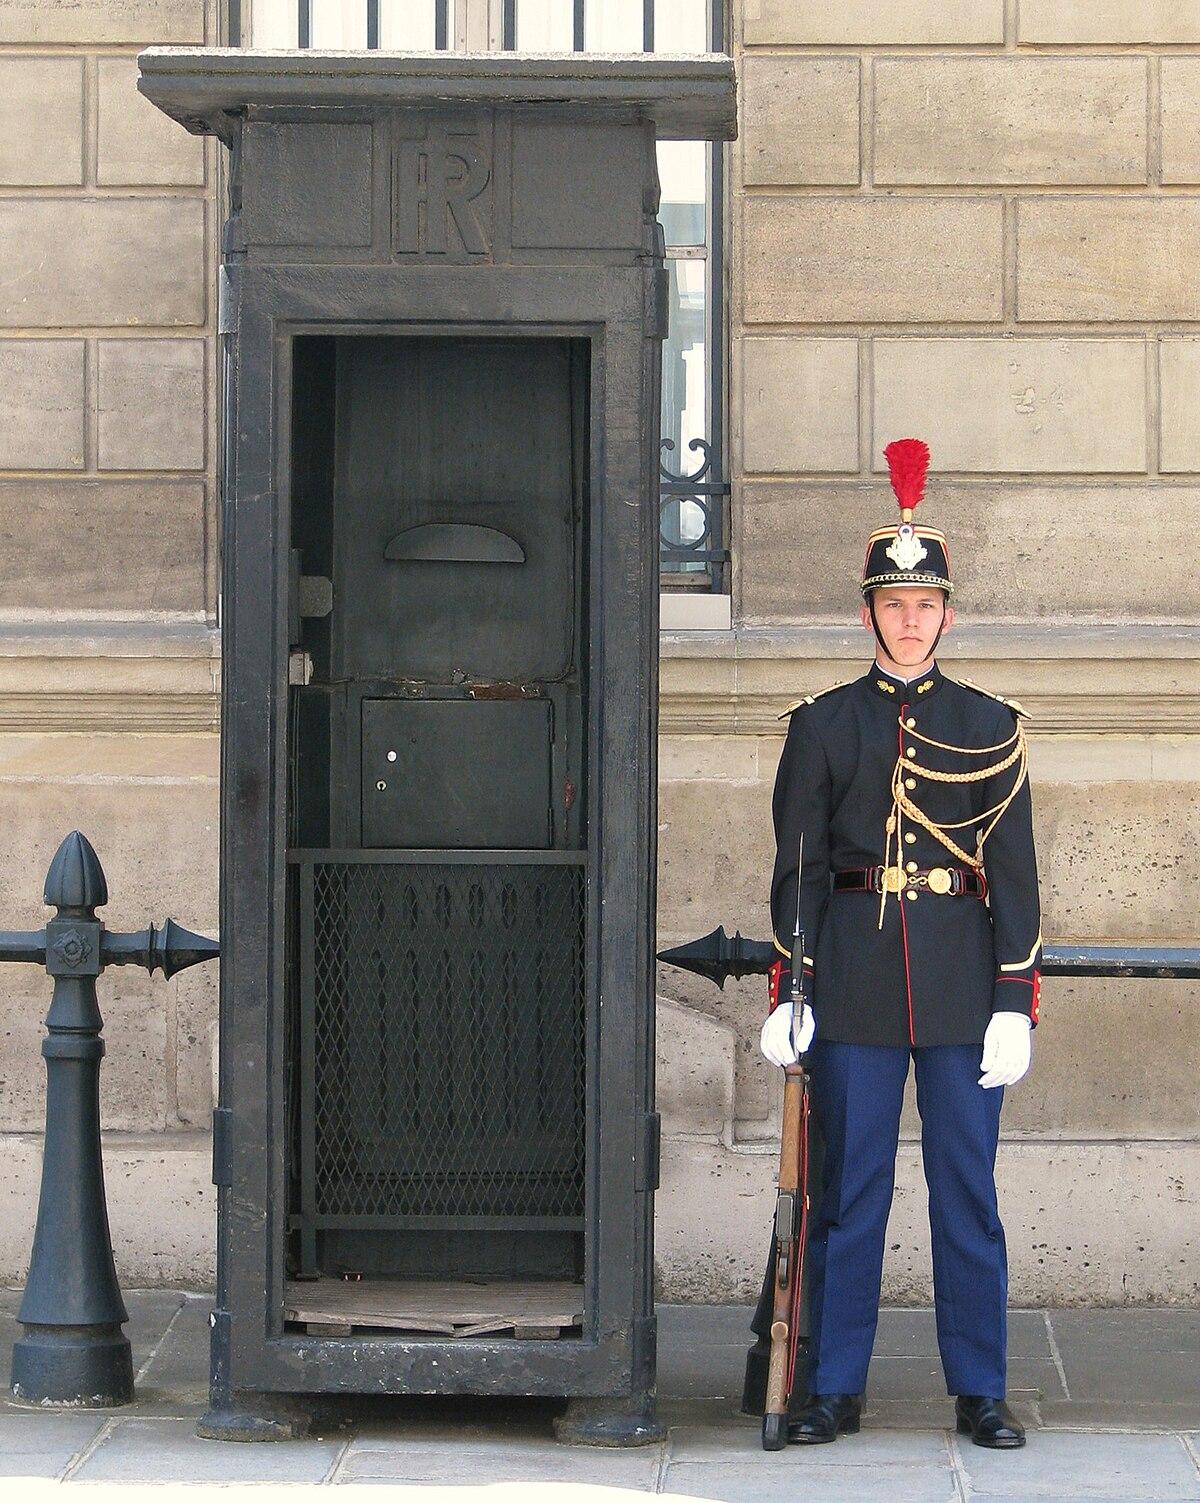 Republican Guard (France) - Wikipedia